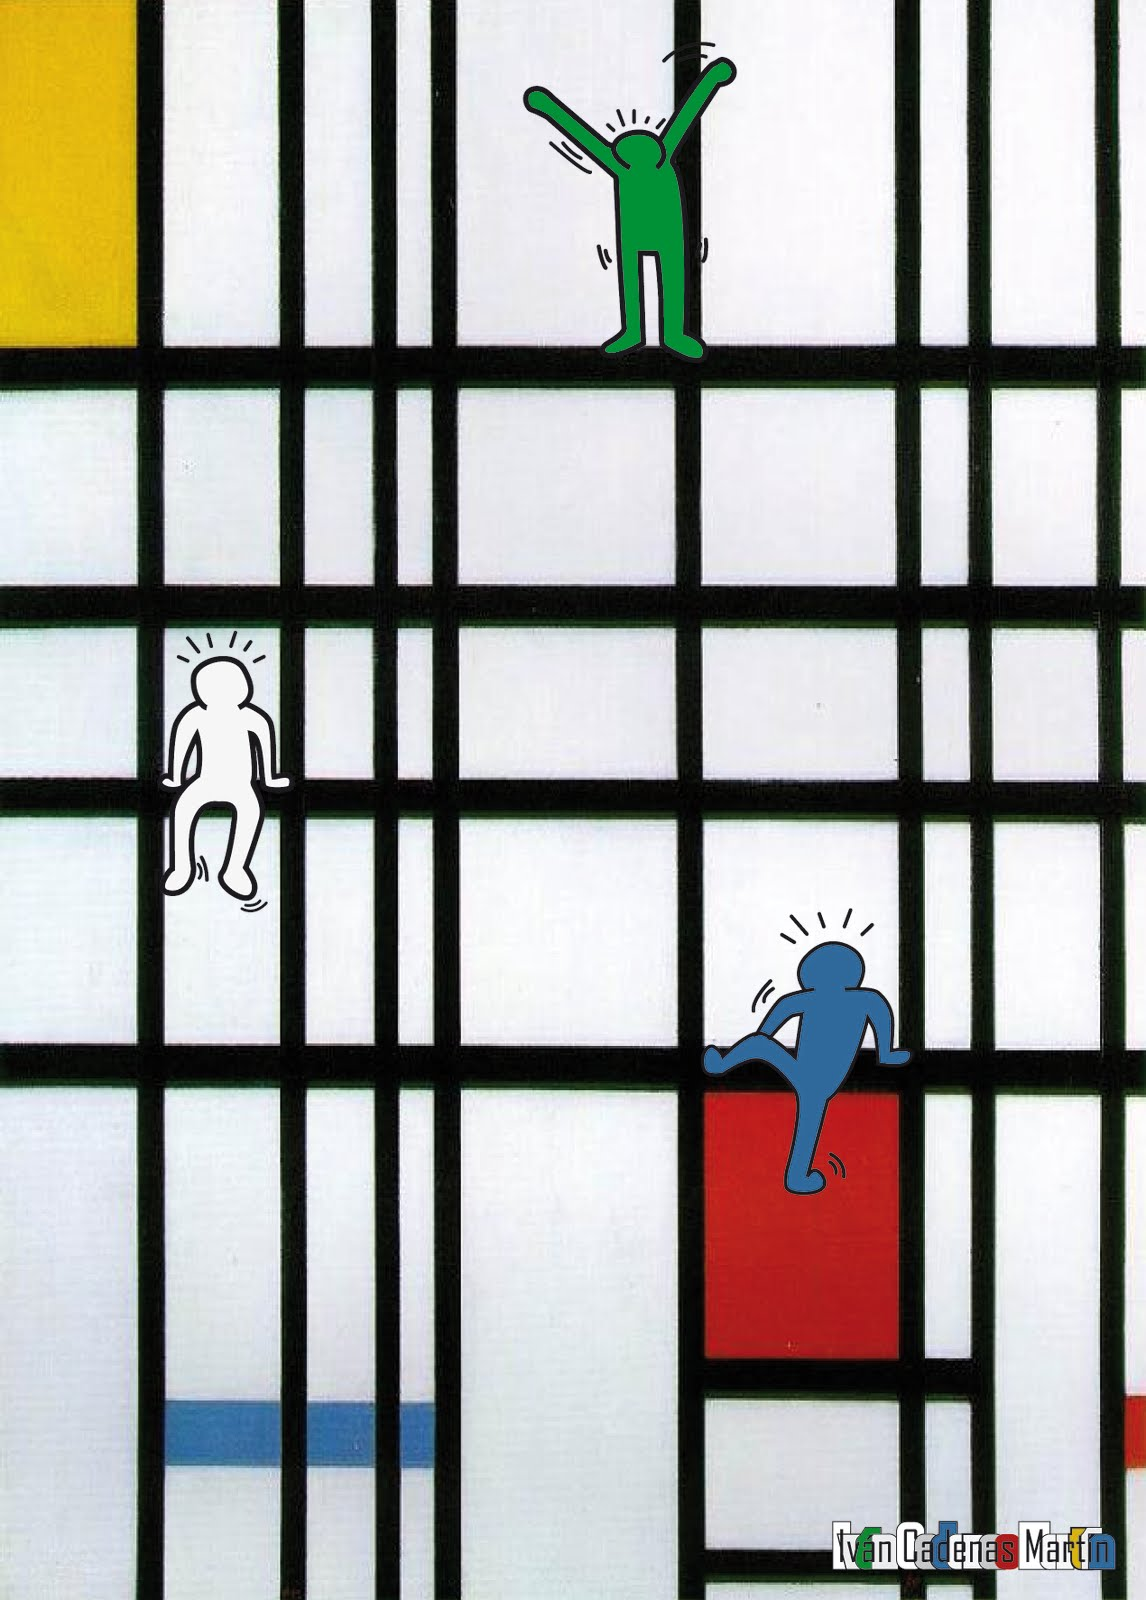 http://1.bp.blogspot.com/_7pPyZkorNVs/TITIkhIIWzI/AAAAAAAAABA/Fa668dGN-tA/s1600/Keith+Haring+%2B+Piet+Mondrian.jpg